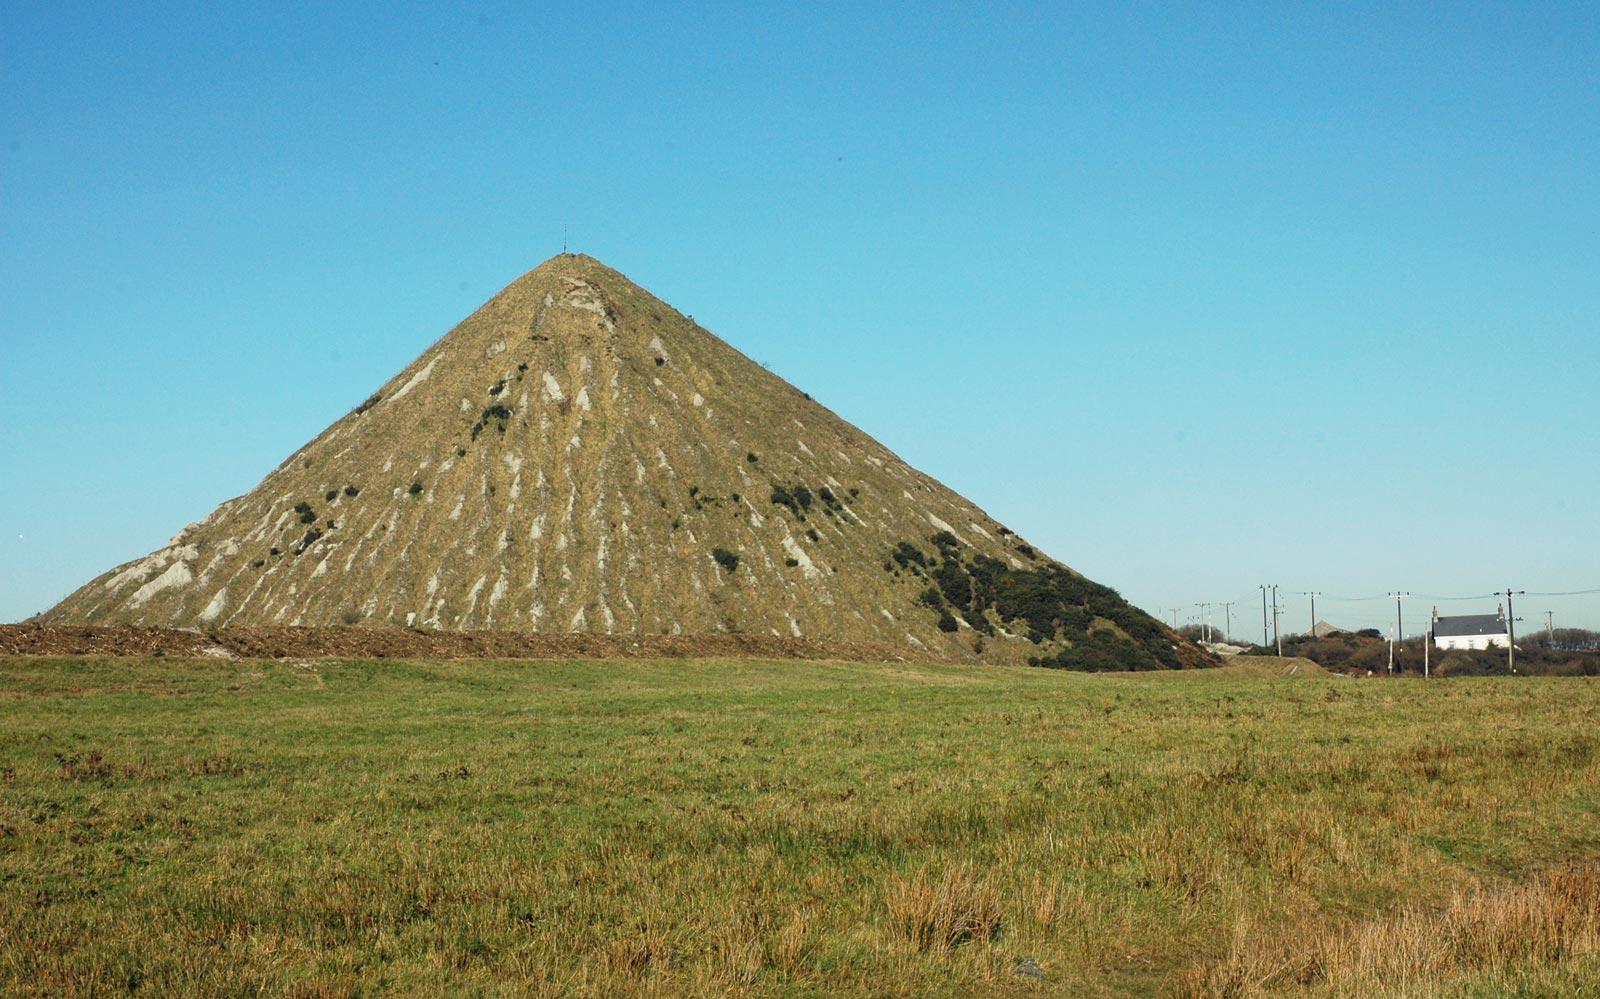 cornish pyramid cornwall guide